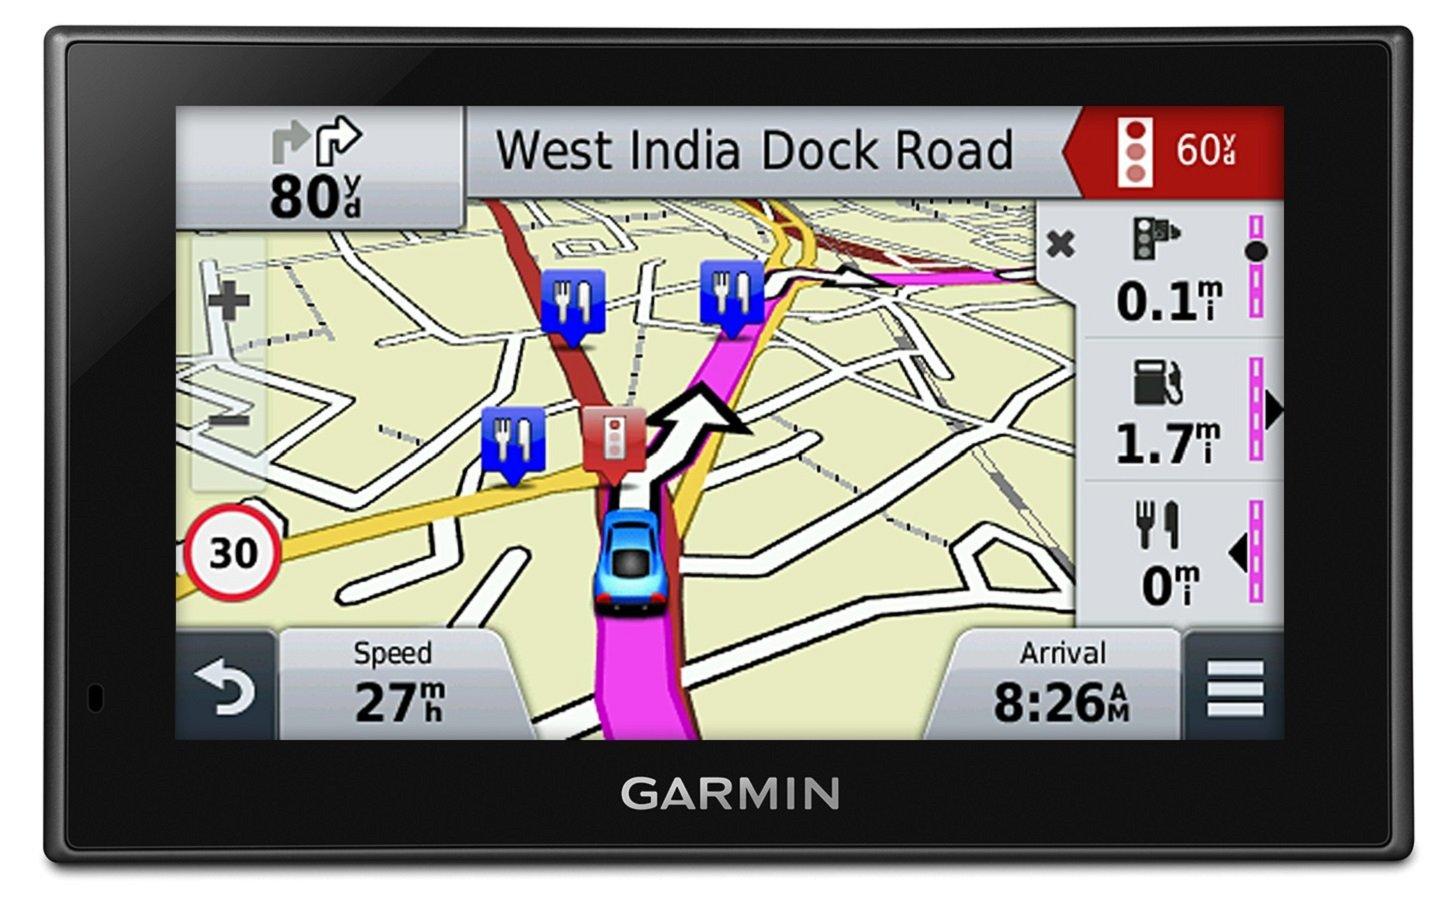 Garmin Nuvi LMTD Sat Nav Inch Free Lifetime Map Updates - Garmin maps for united kingdom